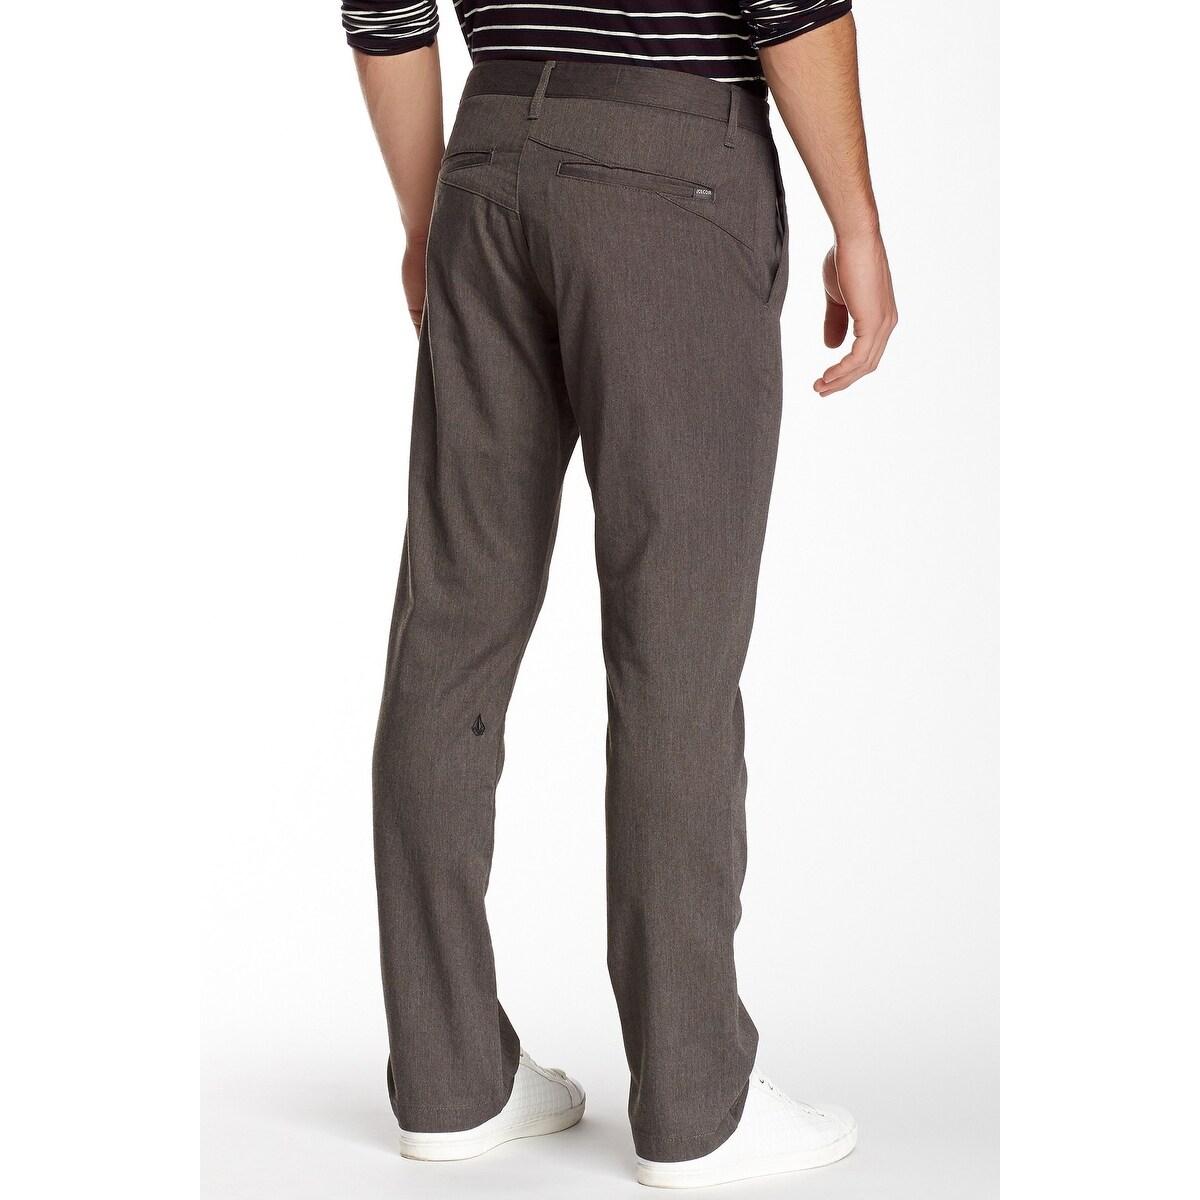 NEW Volcom Mens VMONTY Stretch Shorts Modern Fit Dark Gray Chinos Size 30